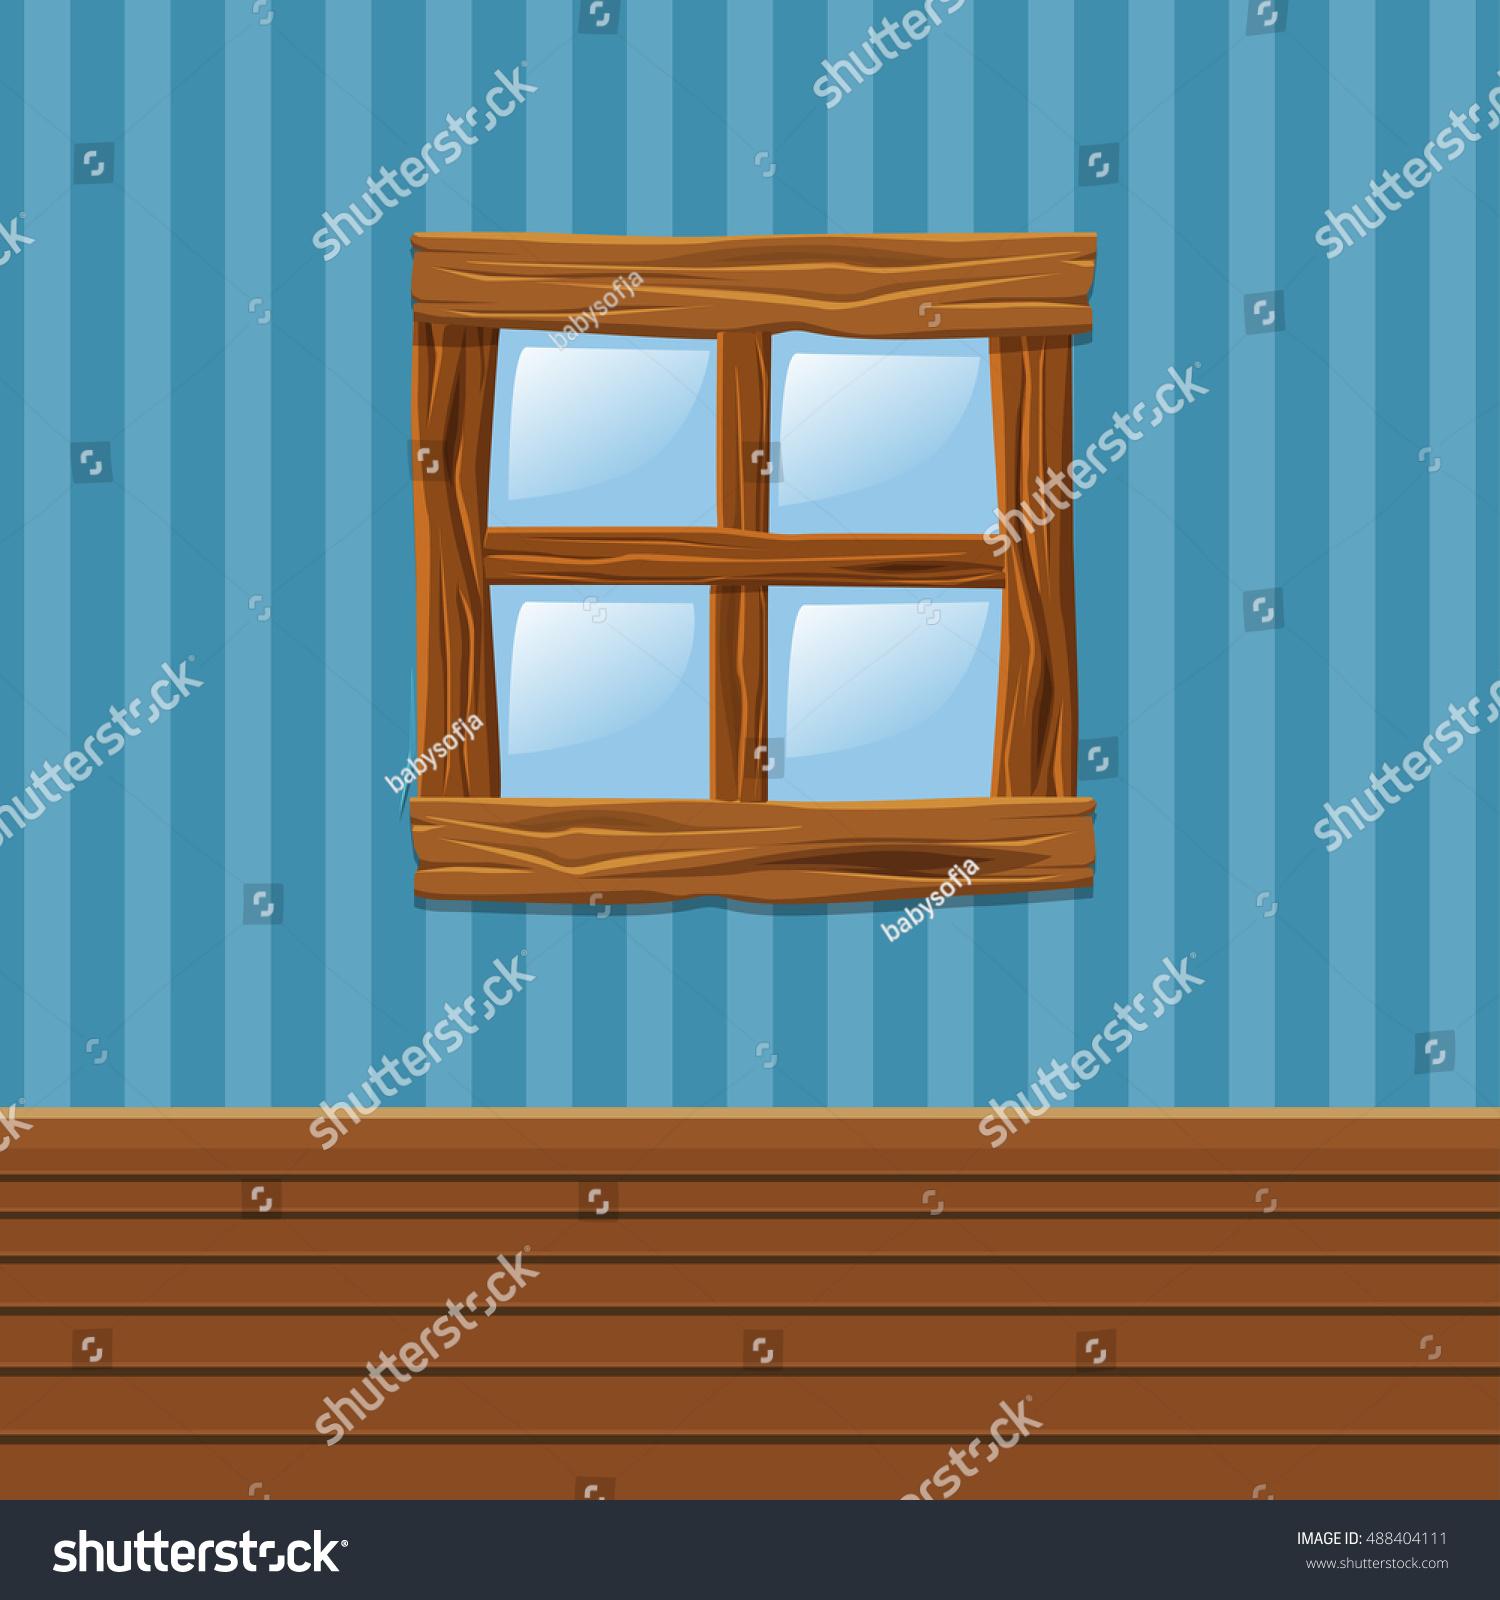 Interior wooden shelves free vector - Cartoon Wooden Old Window Home Interior In Vector